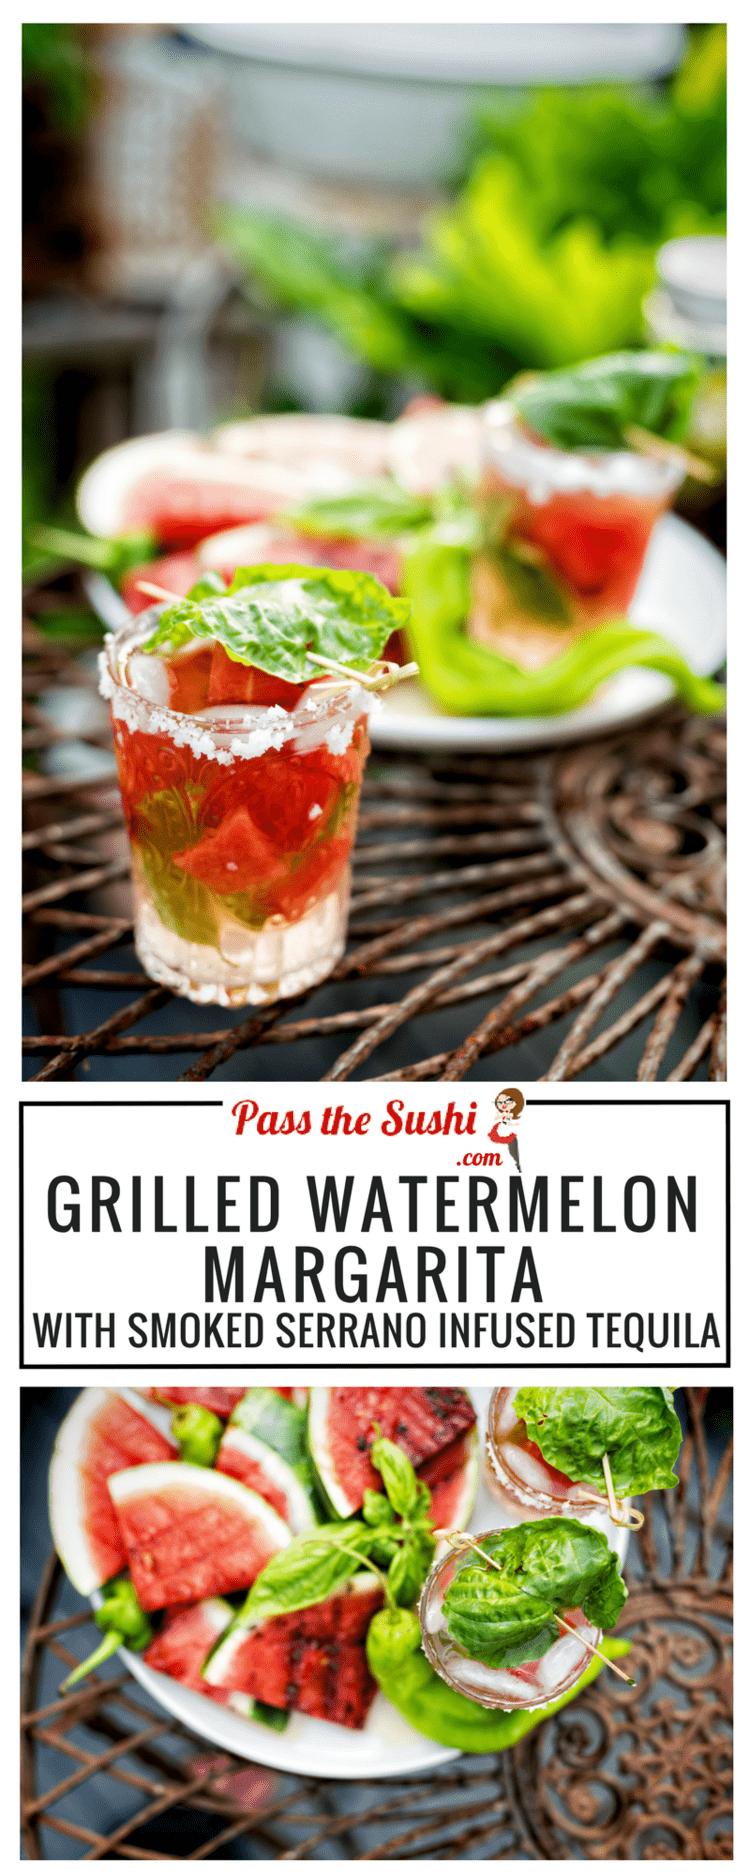 Serrano Infused Grilled Watermelon Margarita Recipe at PasstheSushi.com